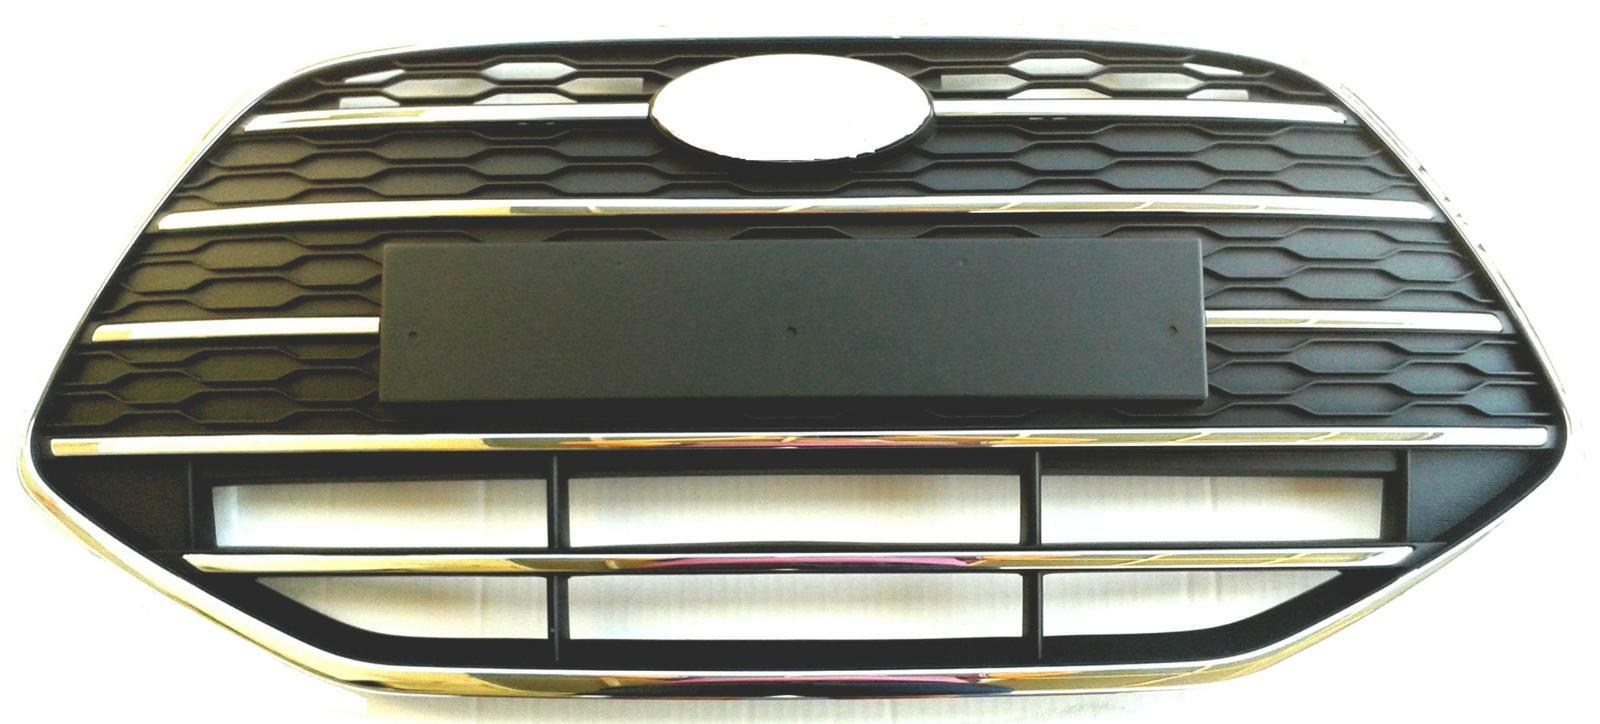 HYUNDAI i20 GB set risparmio Paraurti Barra di ingresso nero 10179-2075